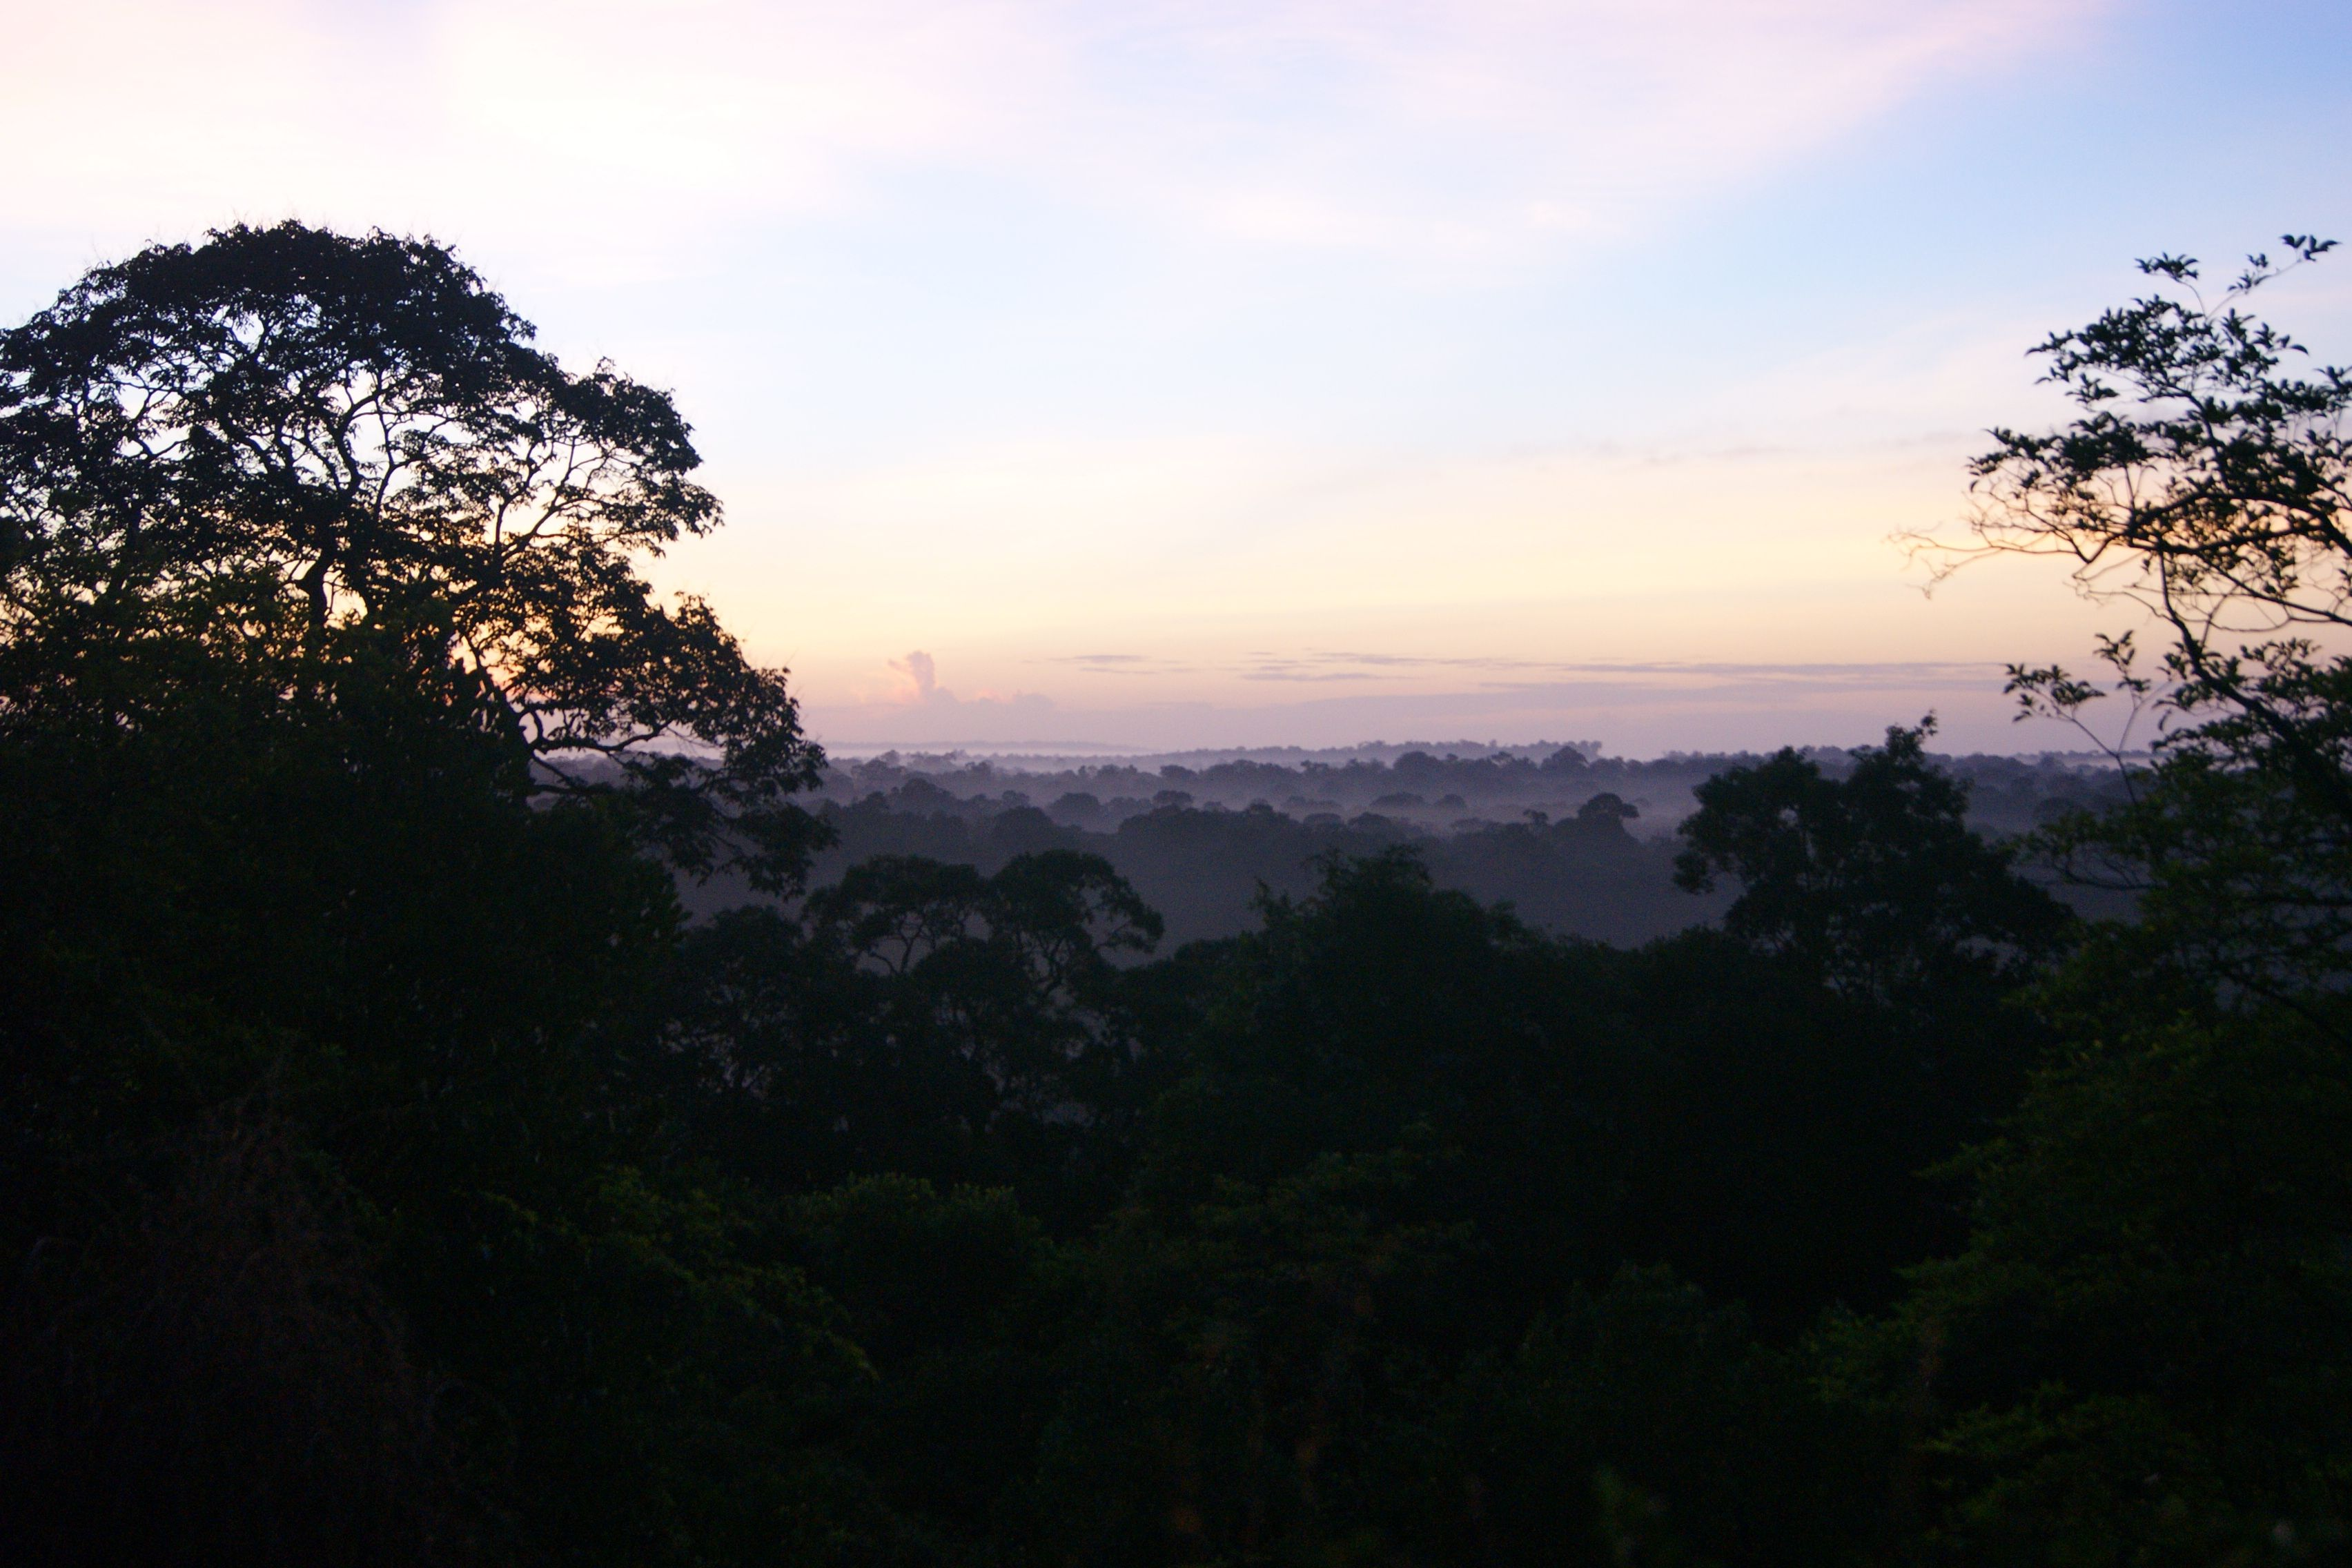 savane roche #guyane une nuit sur la fôret amazonienne http://www.the-bob-trotter.com/2013/12/excursion-savane-roche-guyane.html